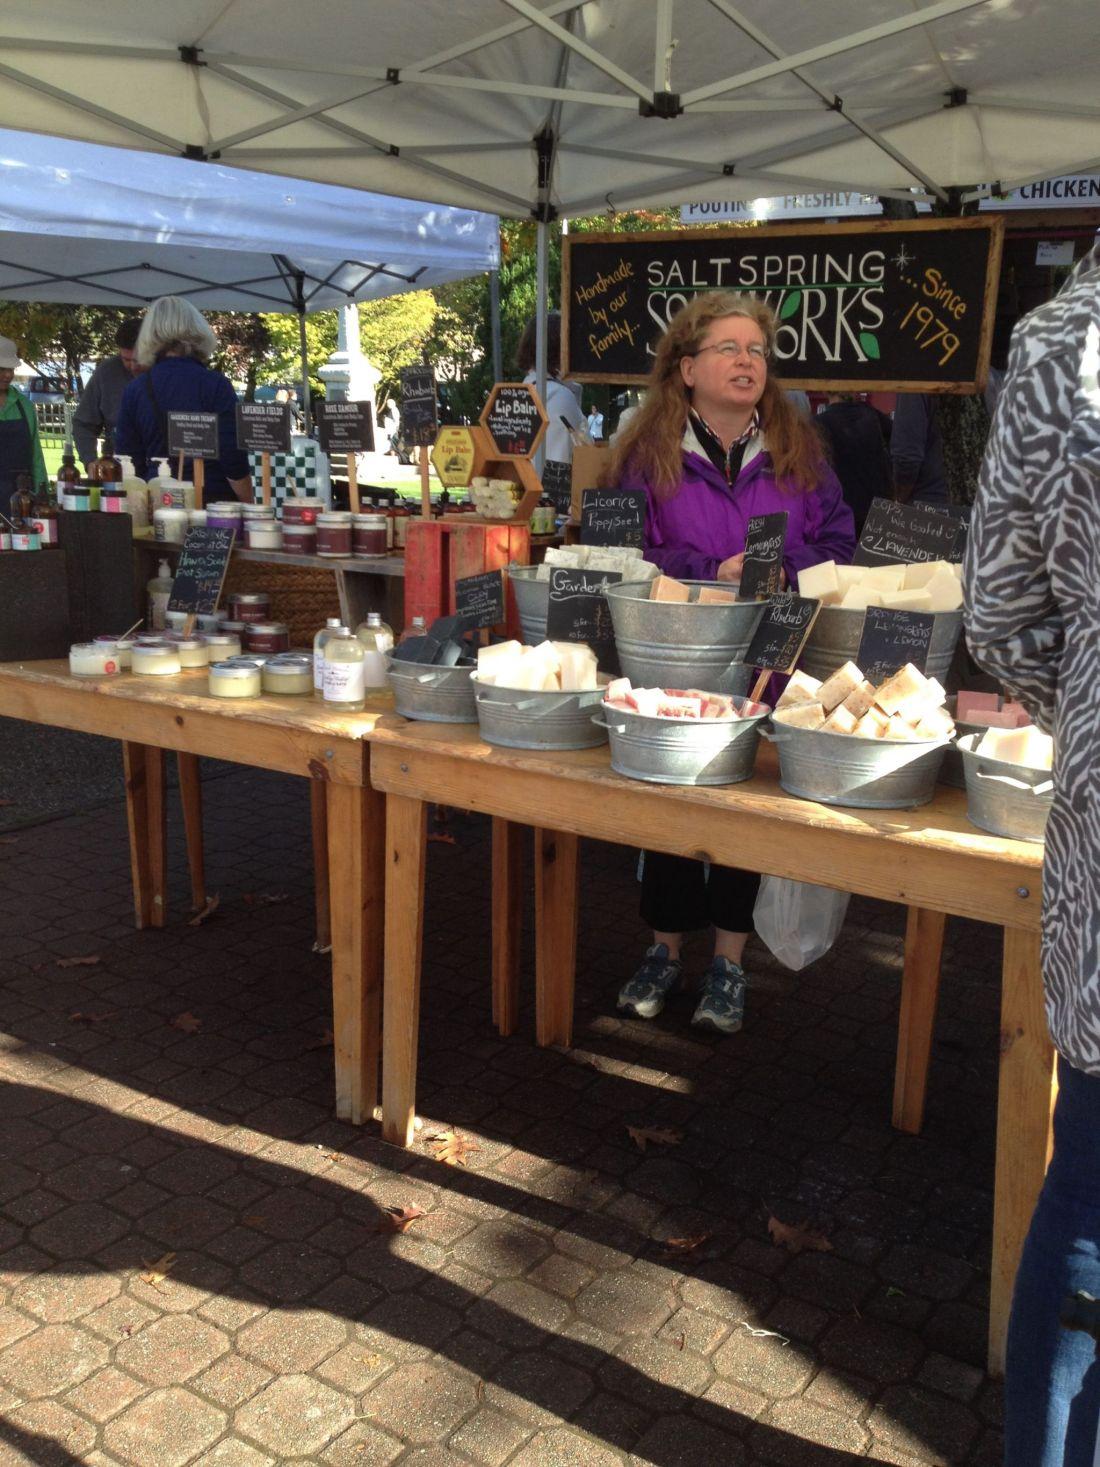 Market stalls on Salt Spring Island, British Columbia